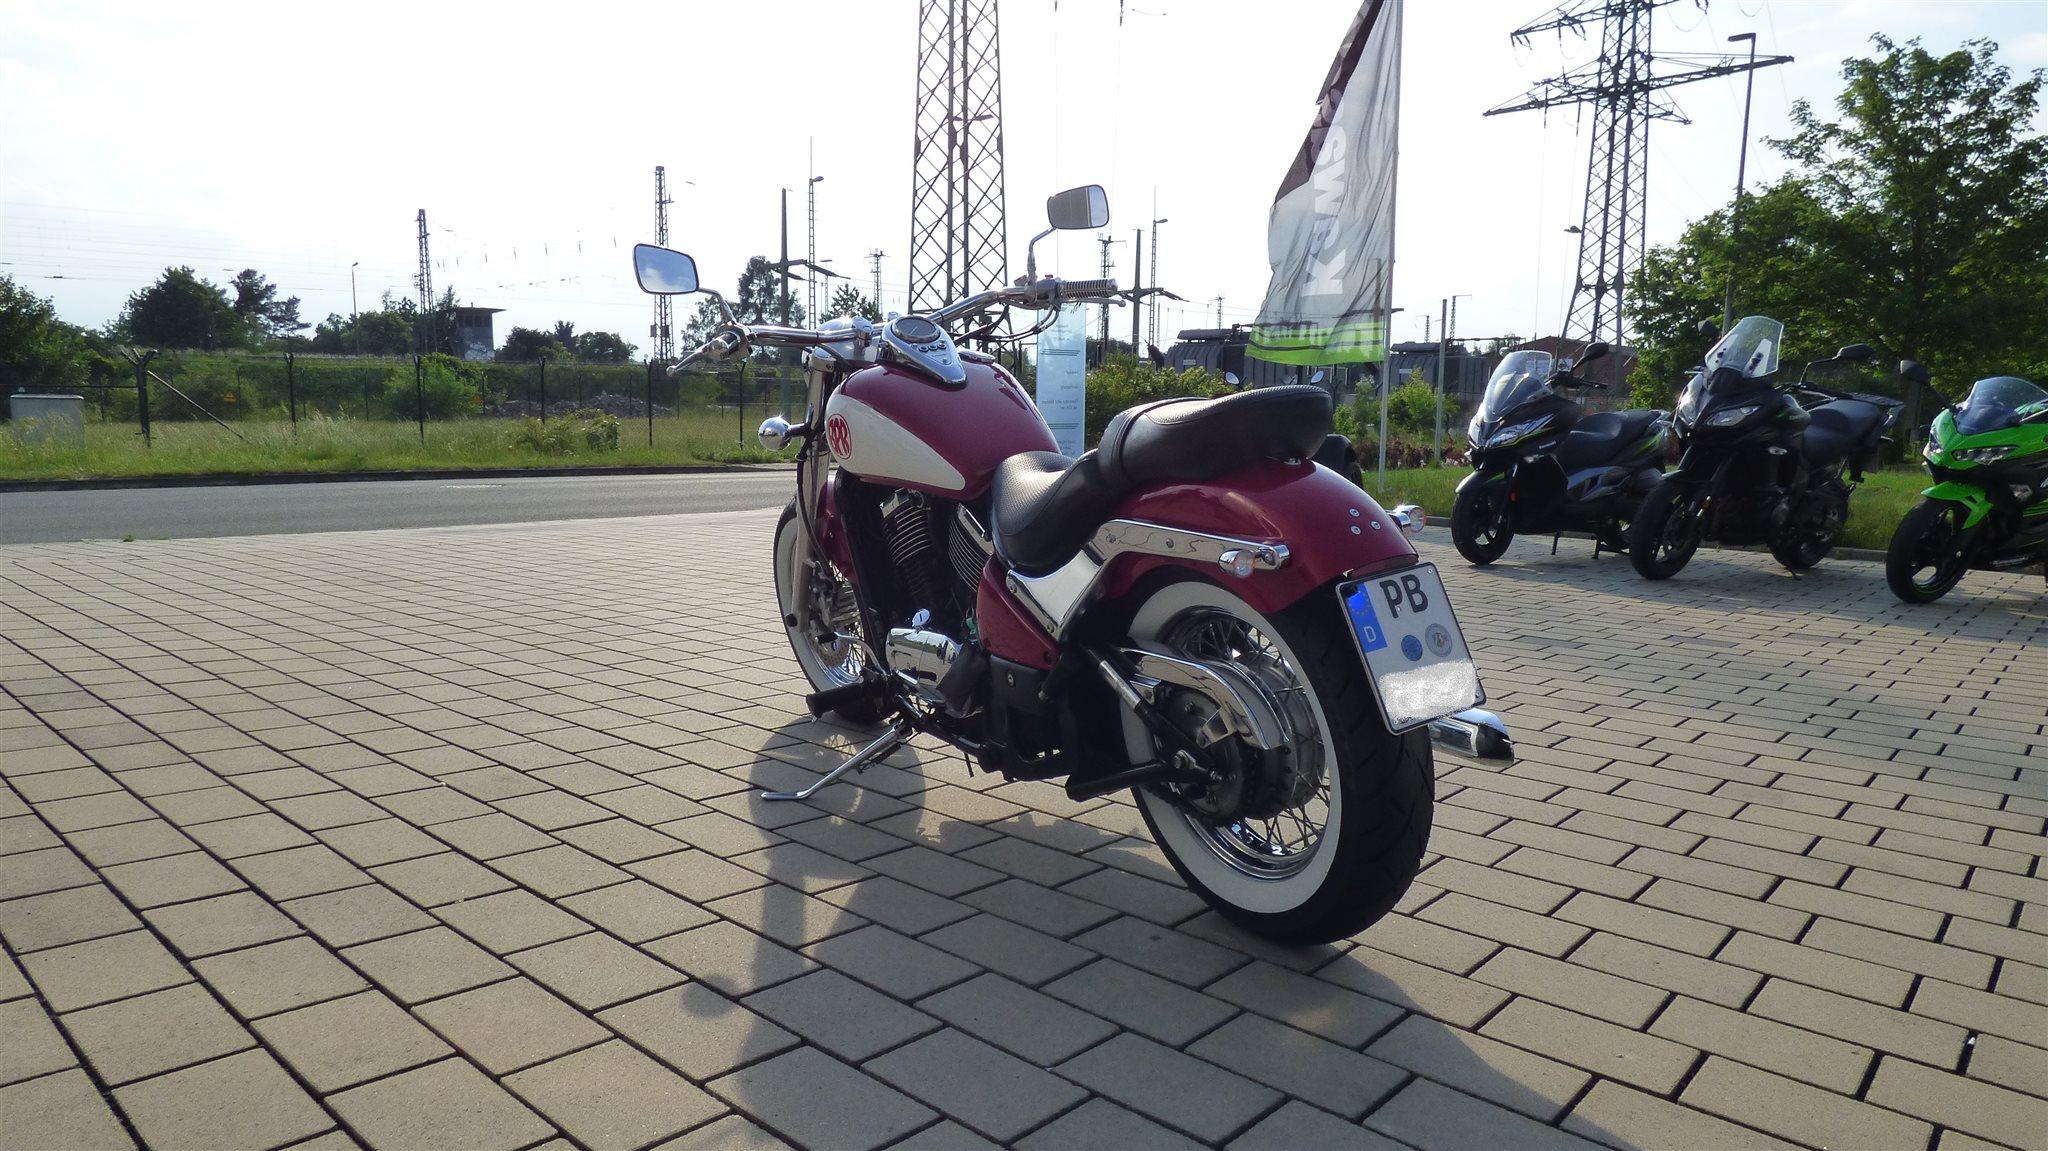 umgebautes motorrad kawasaki vn 800 classic von bpr bikes. Black Bedroom Furniture Sets. Home Design Ideas